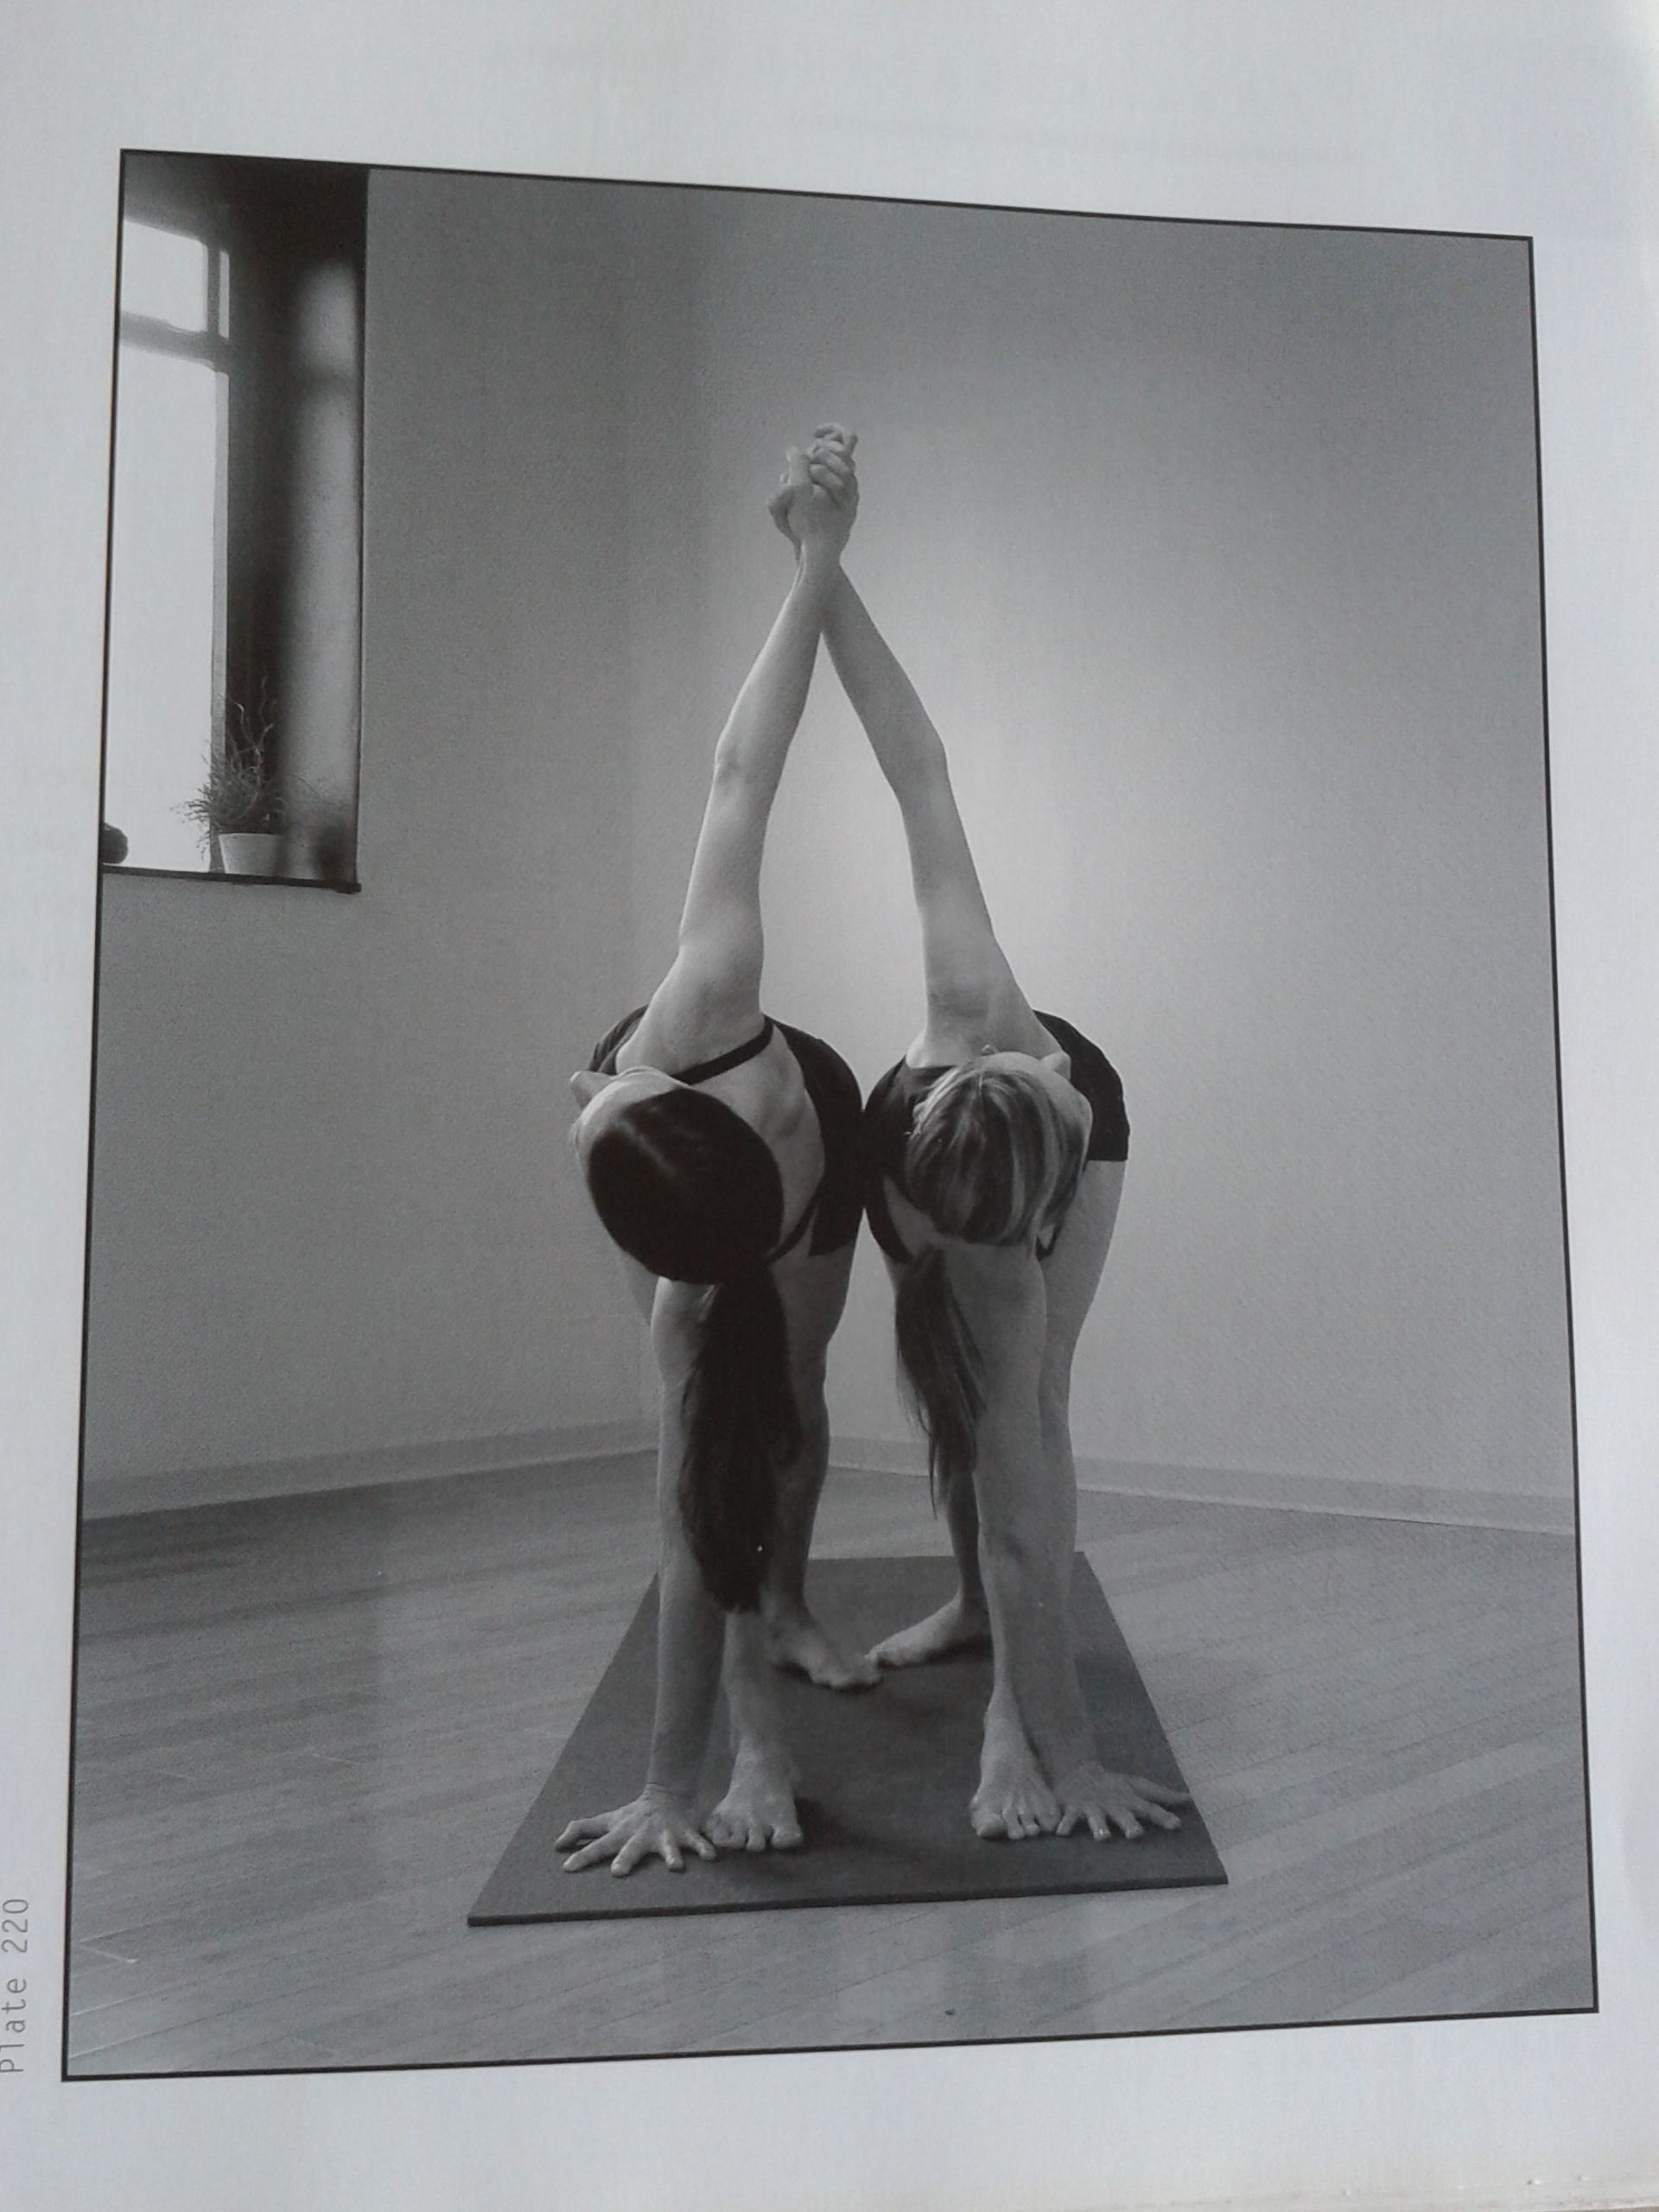 Standing Triangle Partner Pose Partner Yoga Poses Partner Yoga Couples Yoga